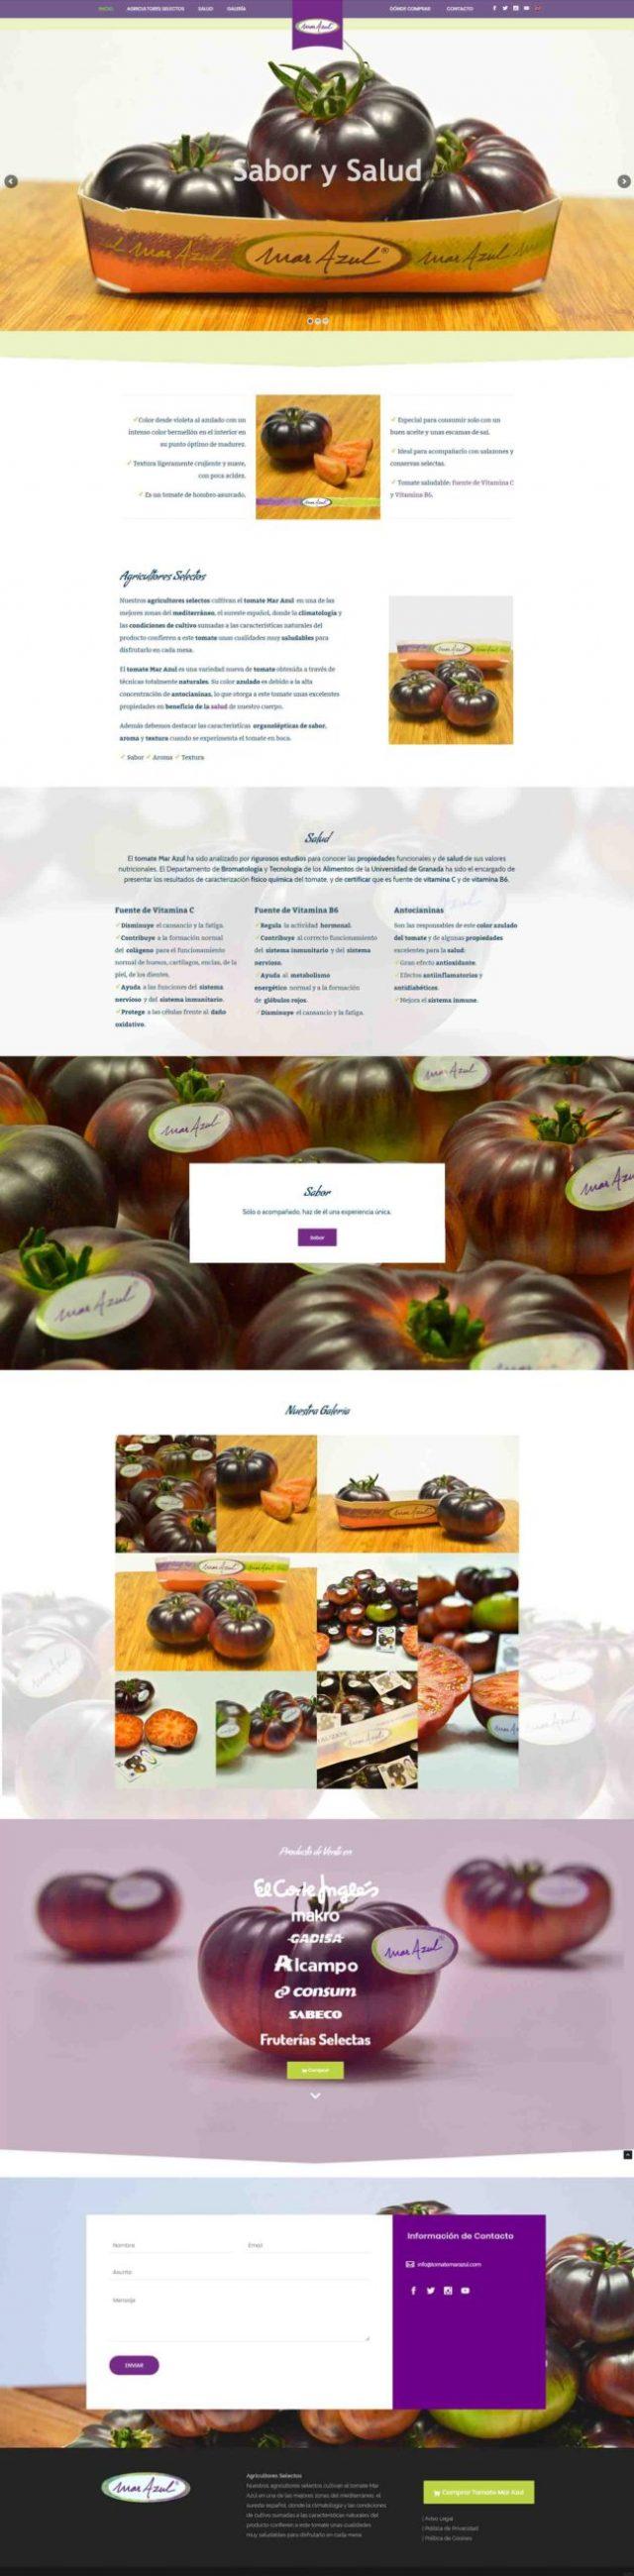 Diseño Web OnePage Tomate Mar Azul